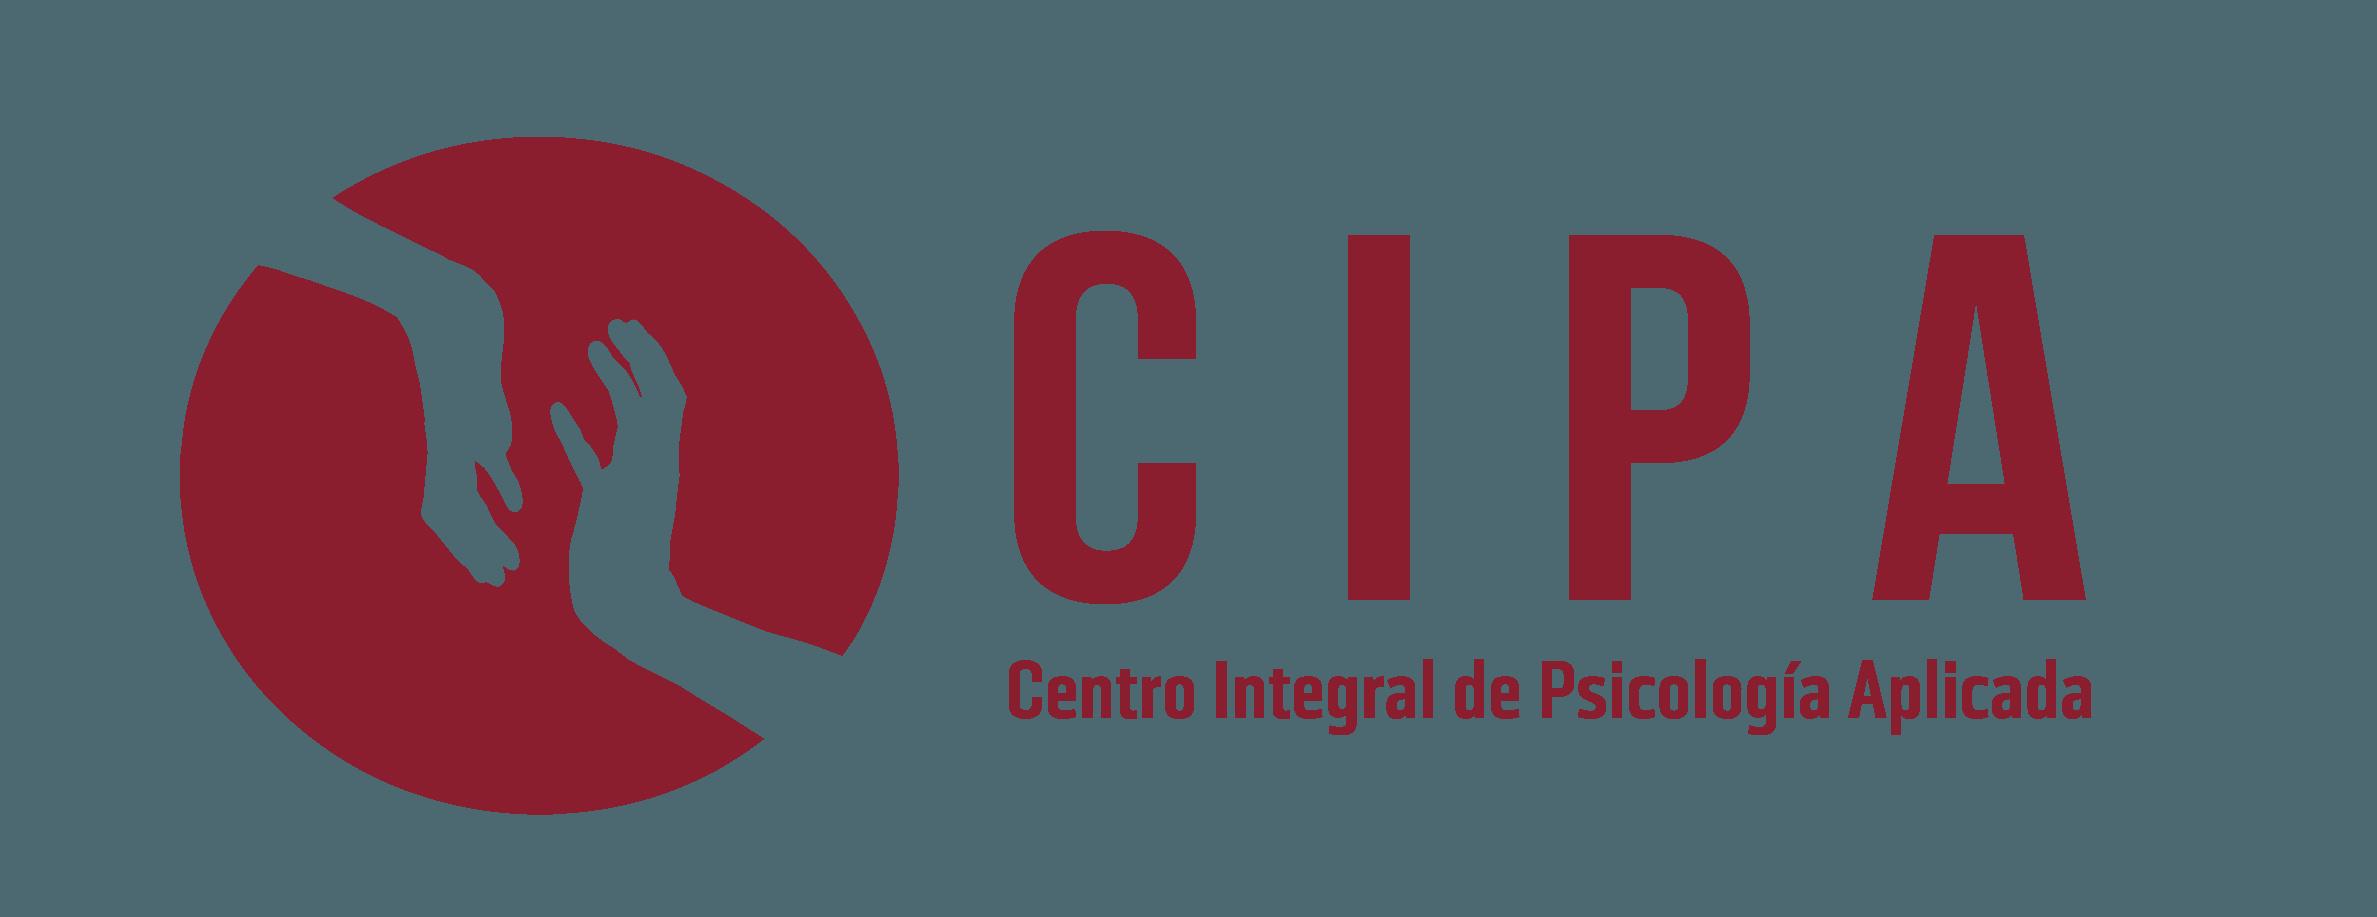 CIPA - Centro Integral de Psicología Aplicada UVG